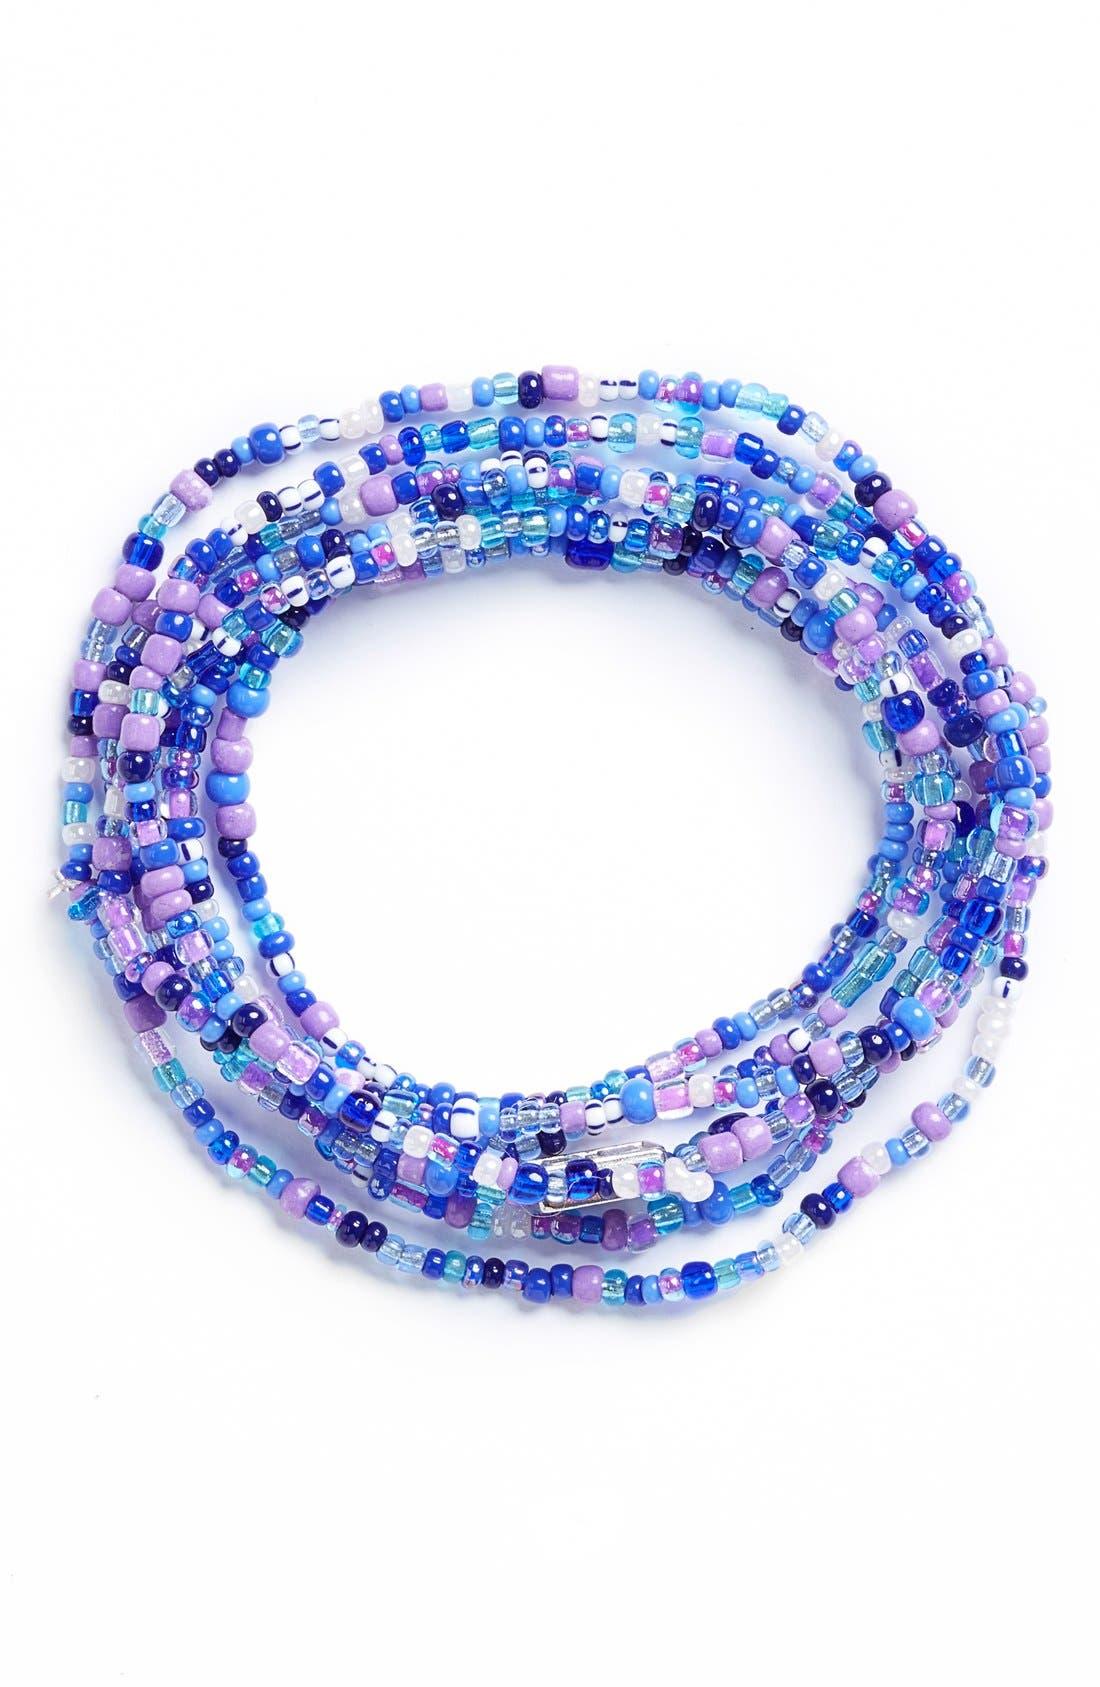 Alternate Image 1 Selected - Me to We 'Rafiki - Water' Beaded Convertible Bracelet